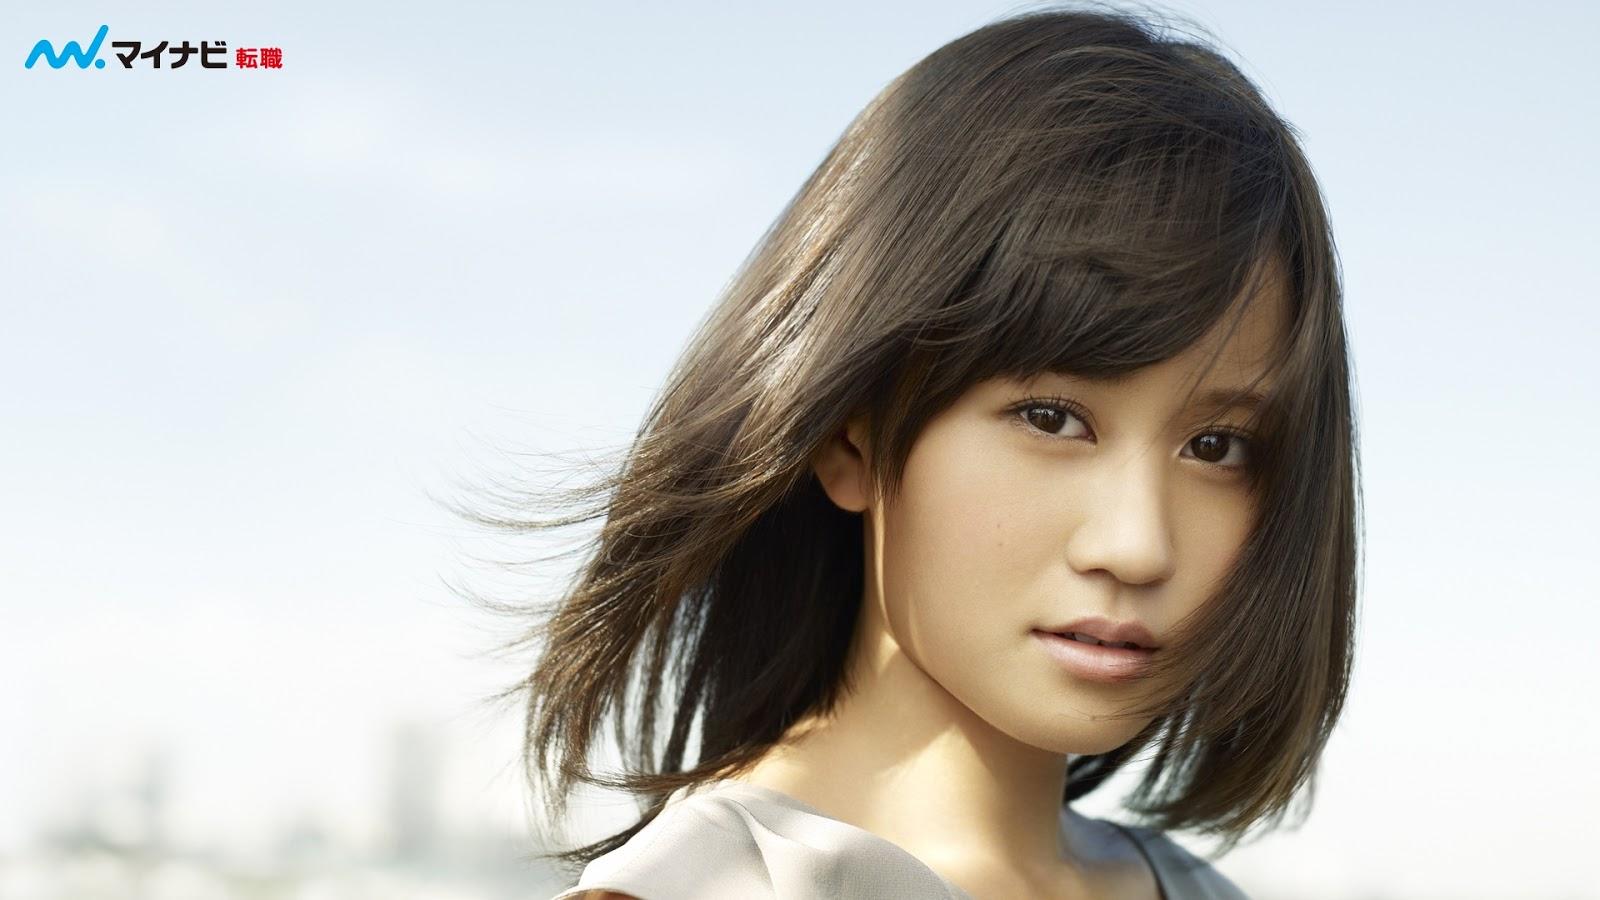 大島優子 Wallpaper: AKB48 Maeda Atsuko 前田敦子 Wallpaper HD